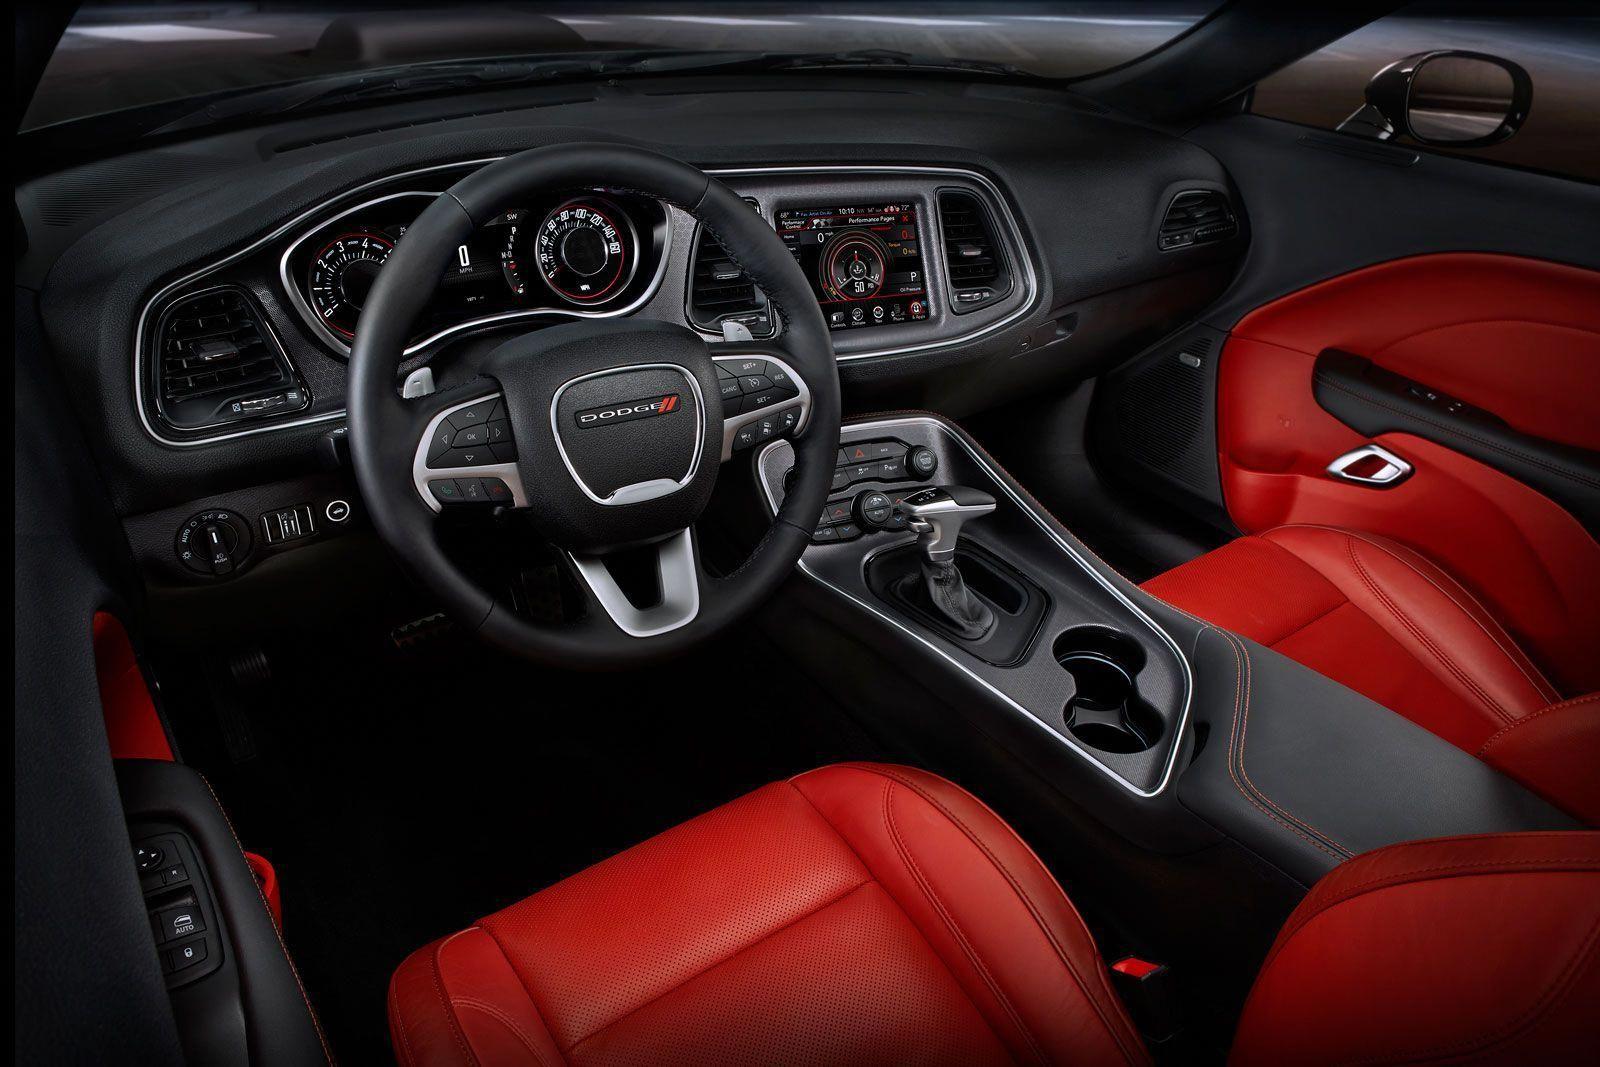 2015 Dodge Challenger Interior Dodgechallenger Dodge Challenger Interior 2015 Dodge Challenger Dodge Challenger Sxt